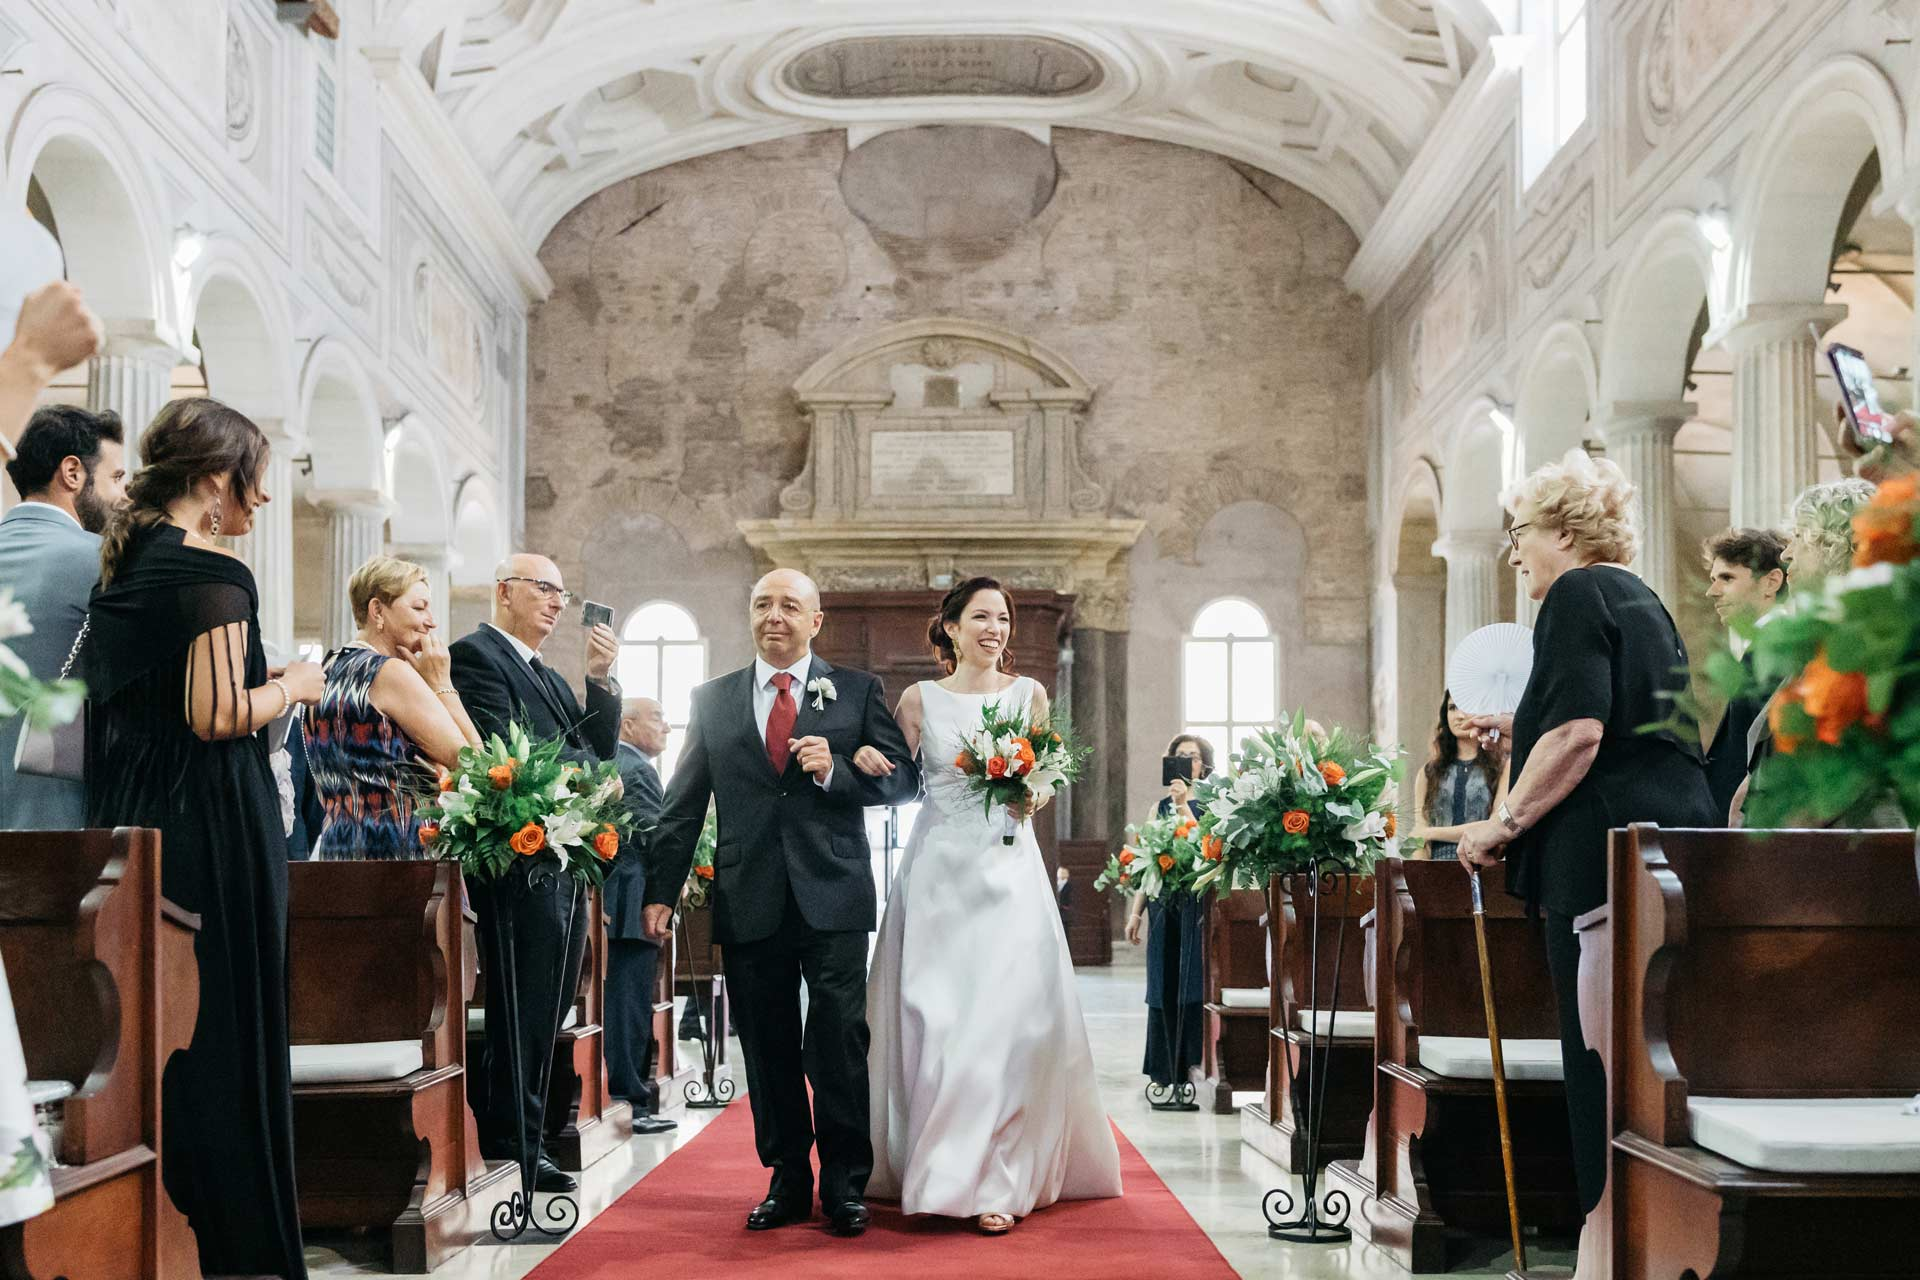 fotografo-matrimonio-reportage-8-C&M-simone-nunzi